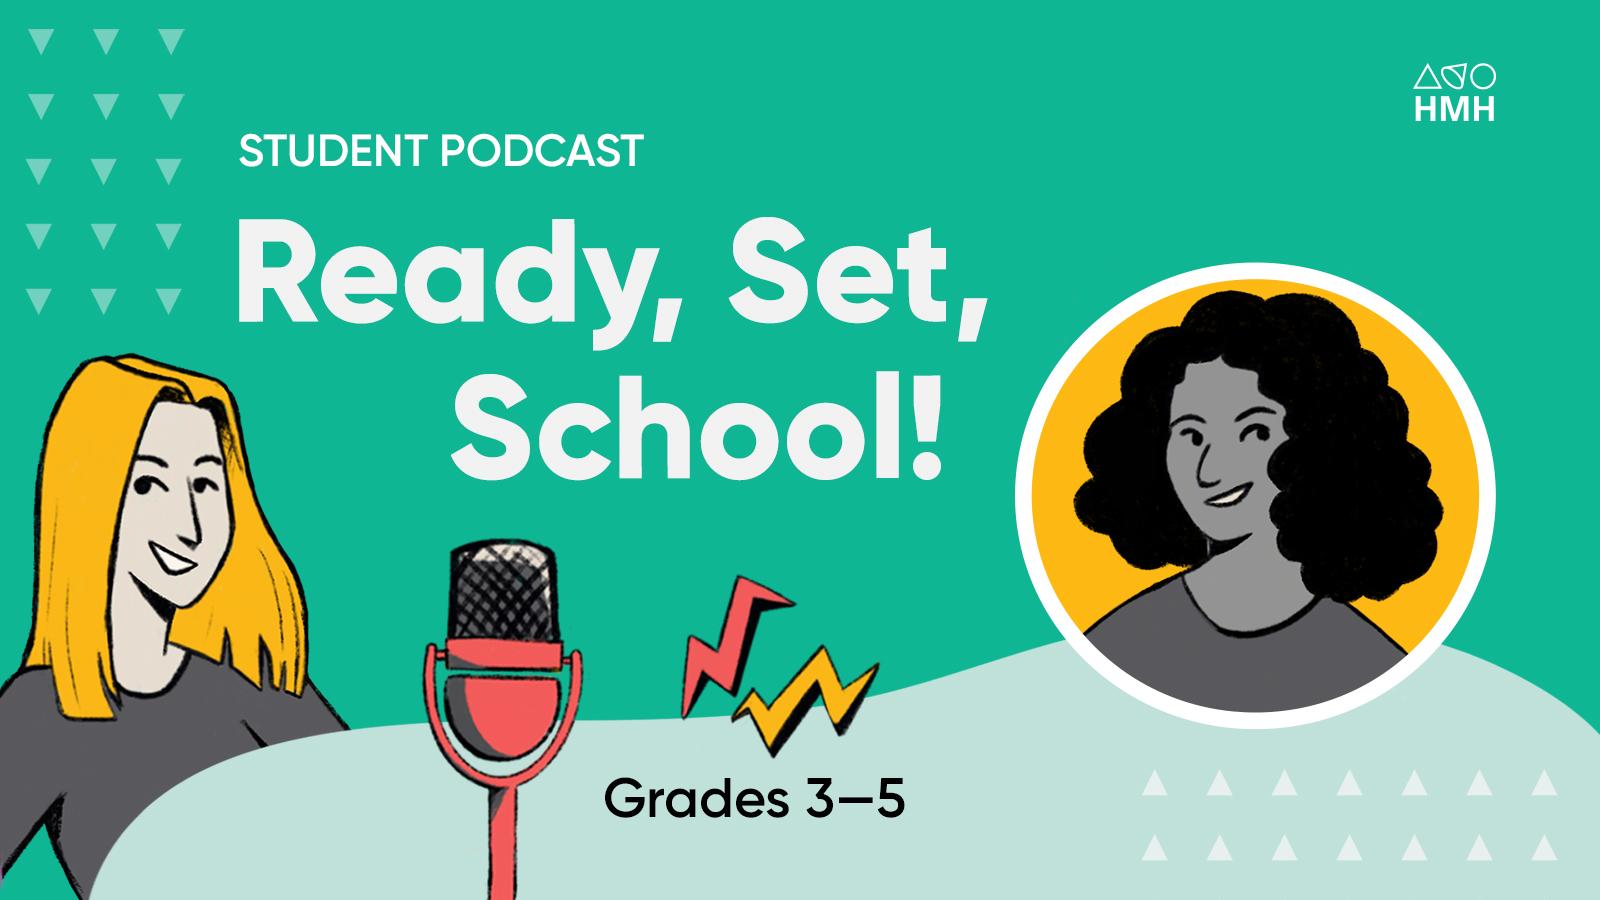 Grades 3–5: Ready, Set, School! Podcast